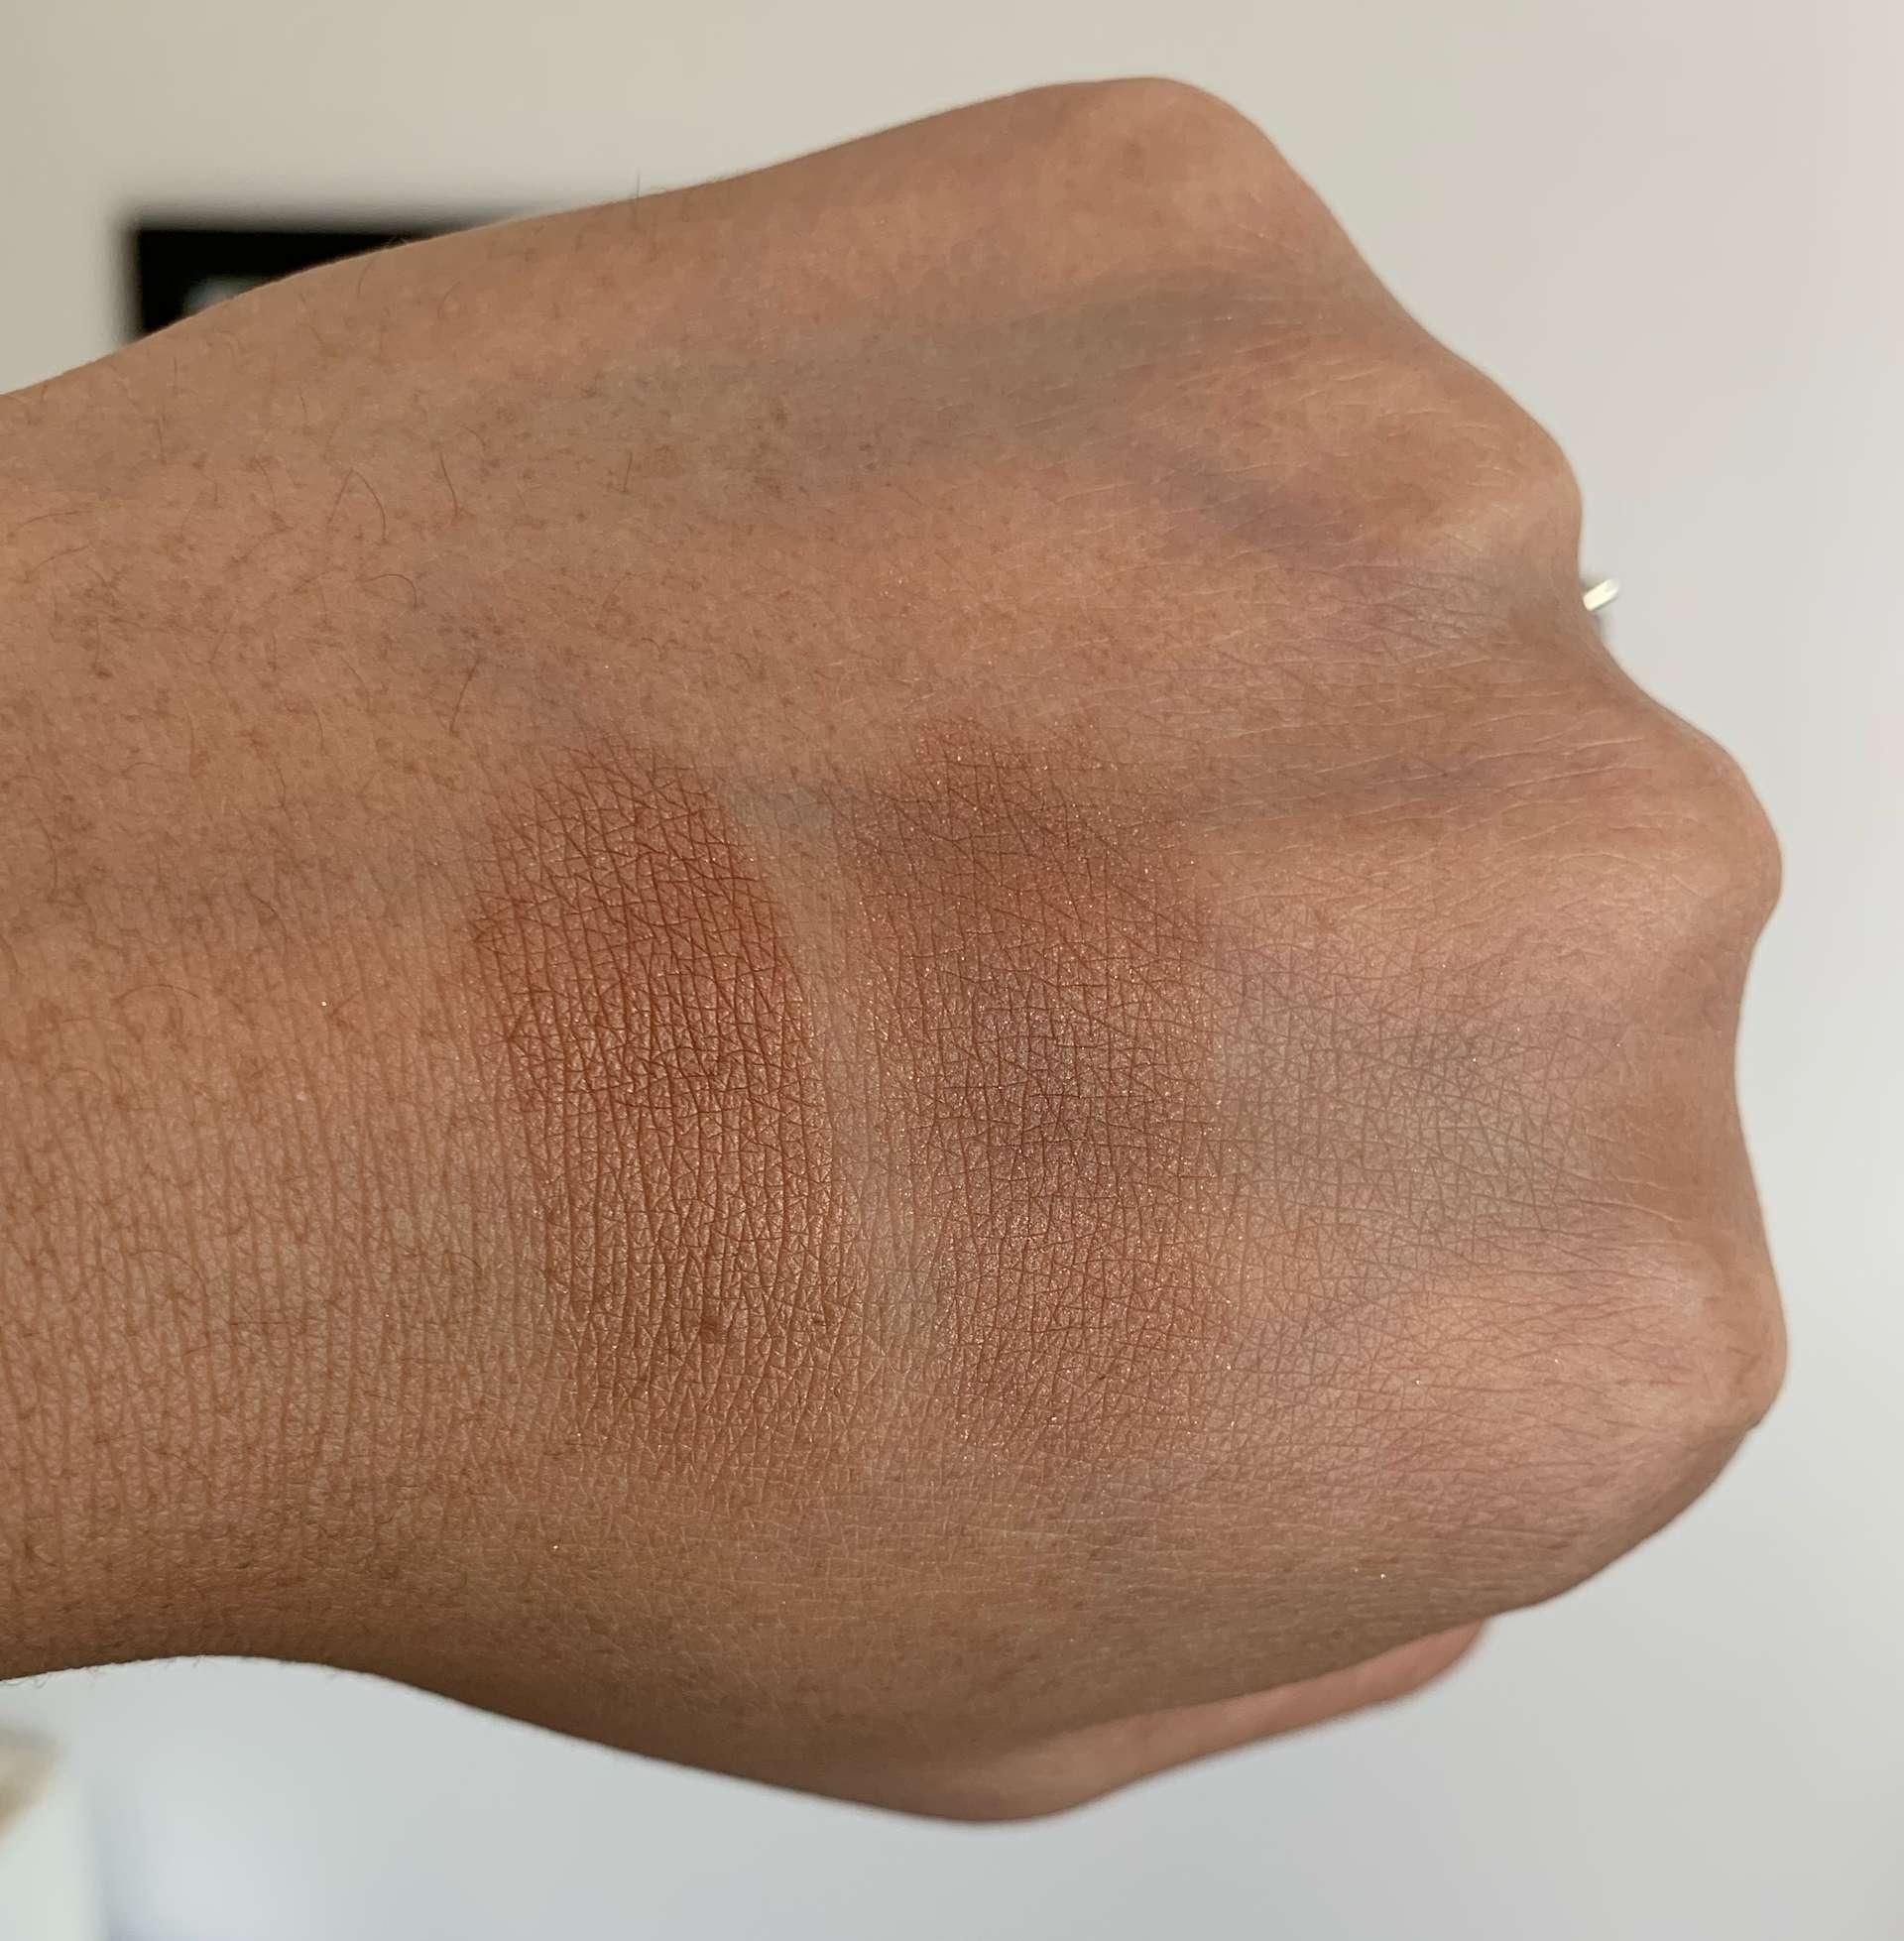 Loreal Lumi Bronze It 03 Deep vs NARS Punta Cana Bronzing Powder Swatches Medium Dark Skin